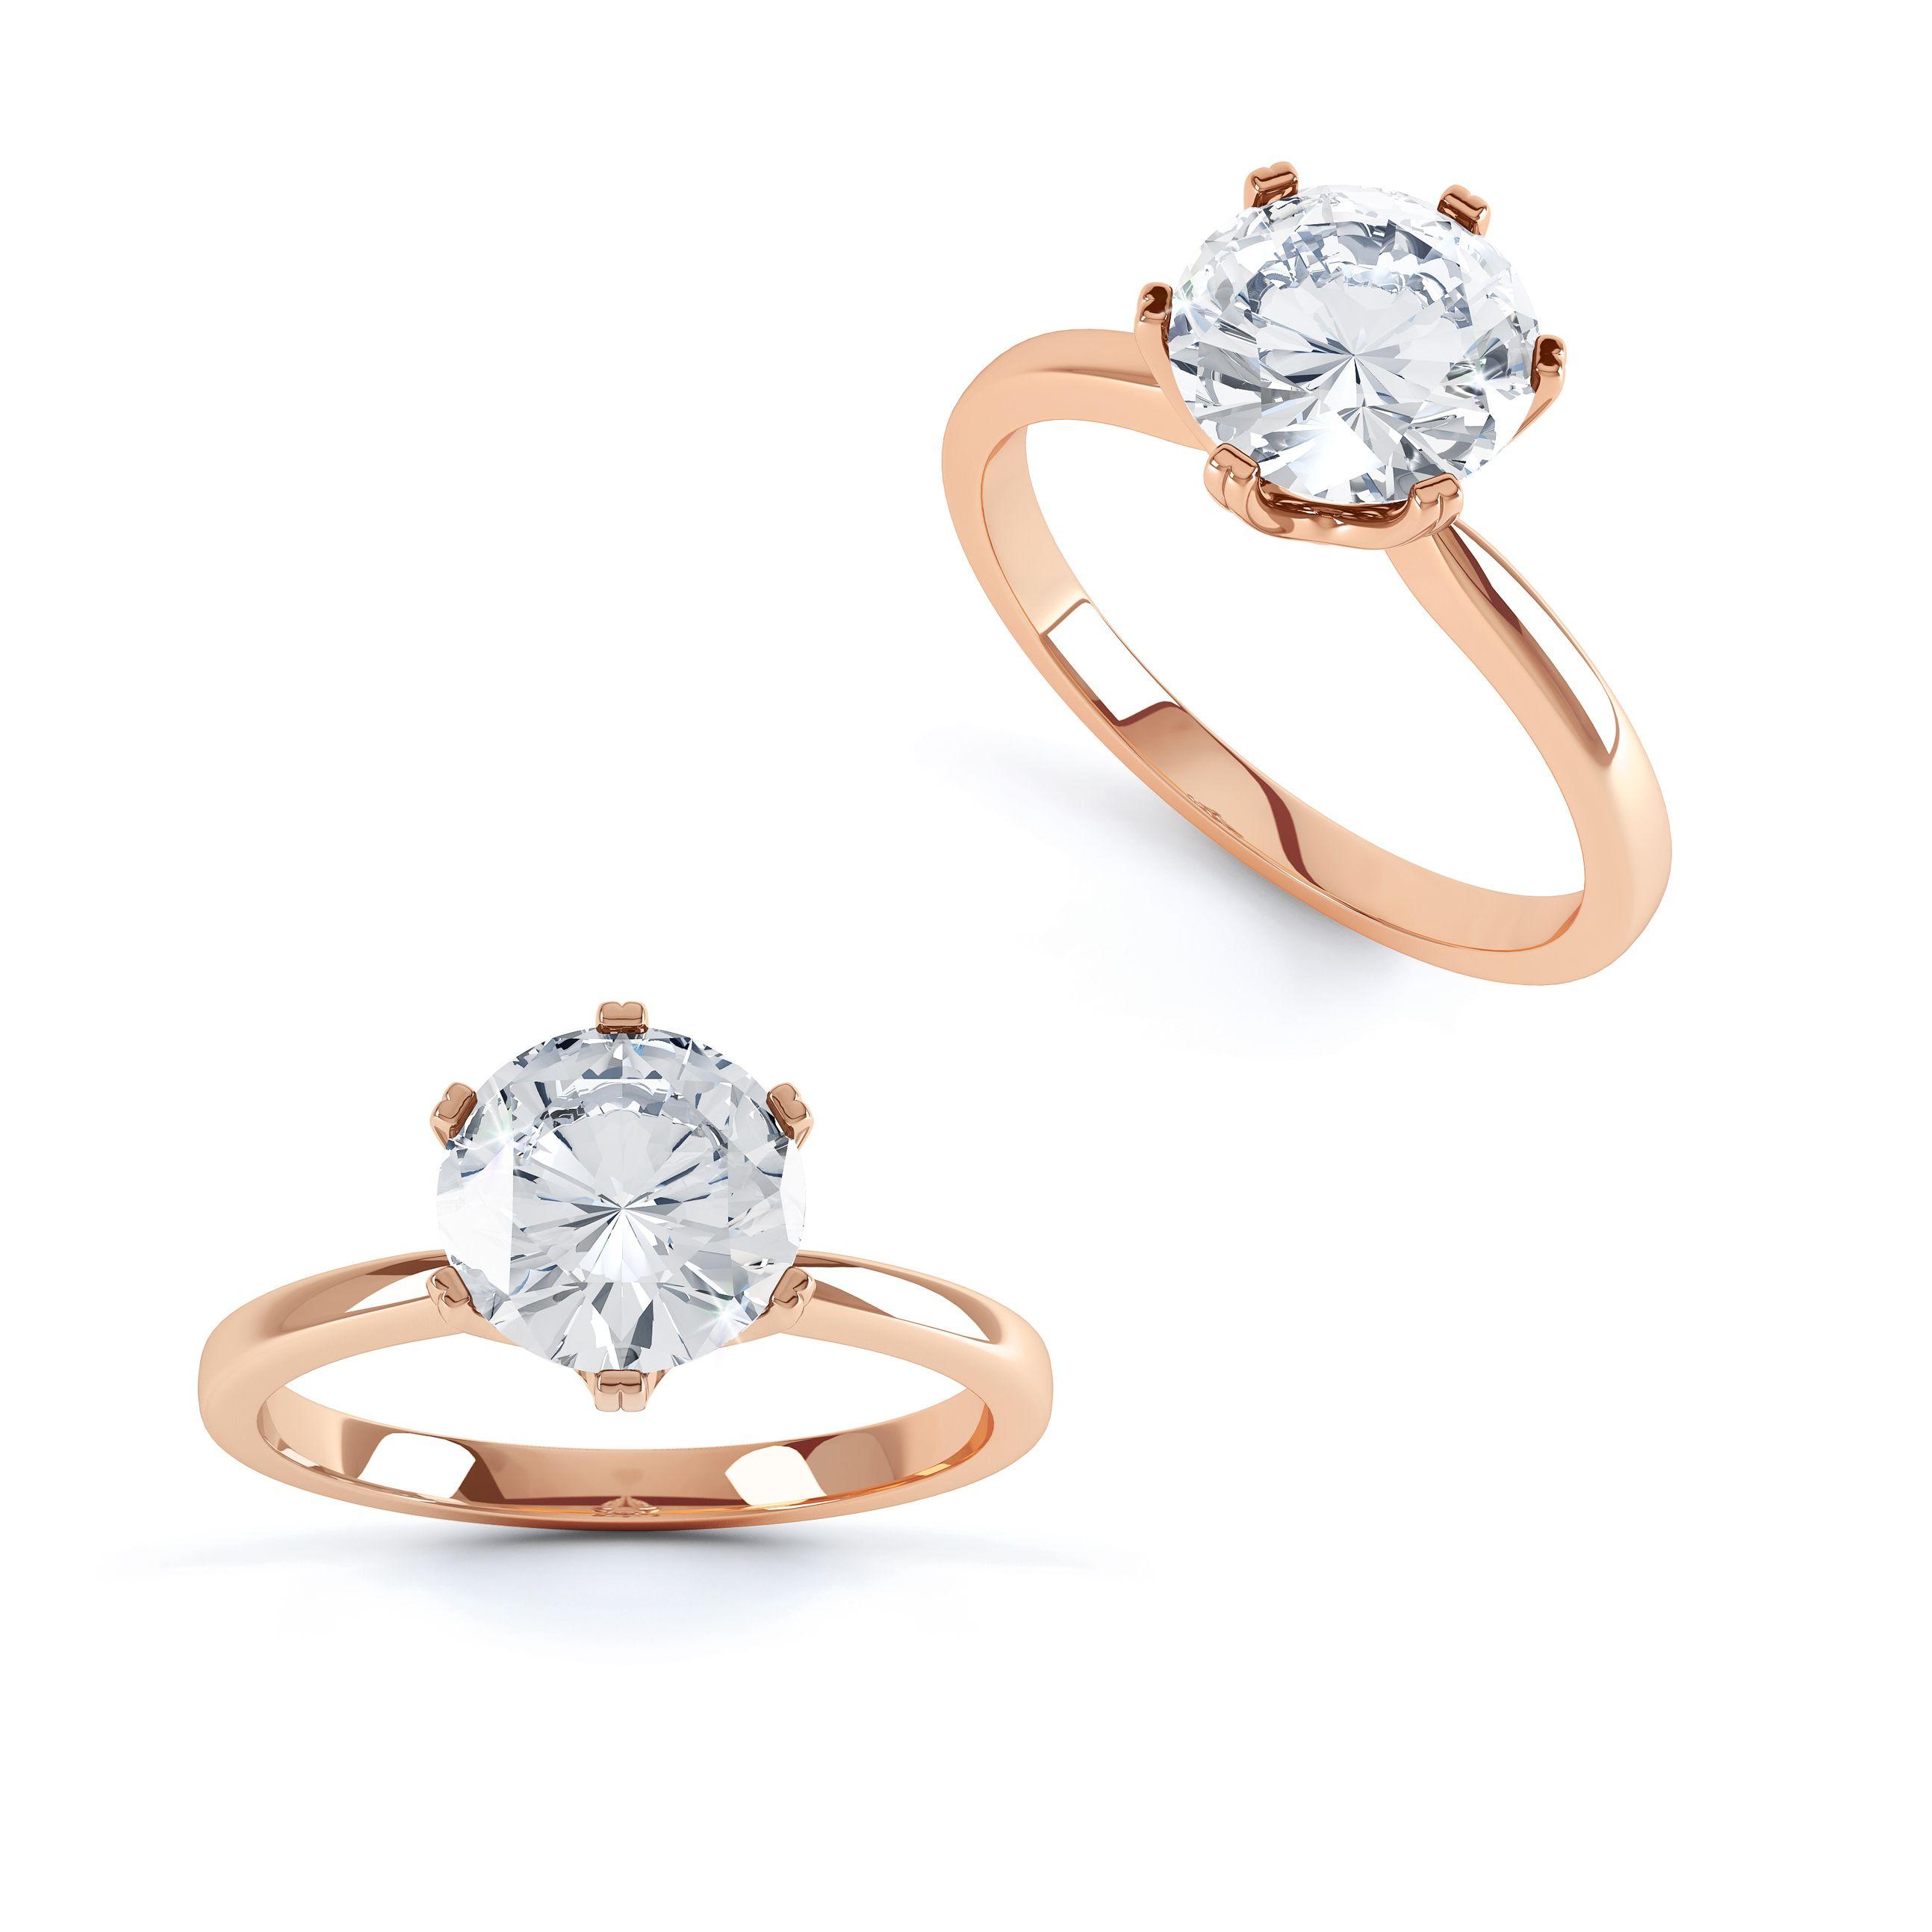 Serenity Moissanite 18k Rose Gold Solitaire Ring One